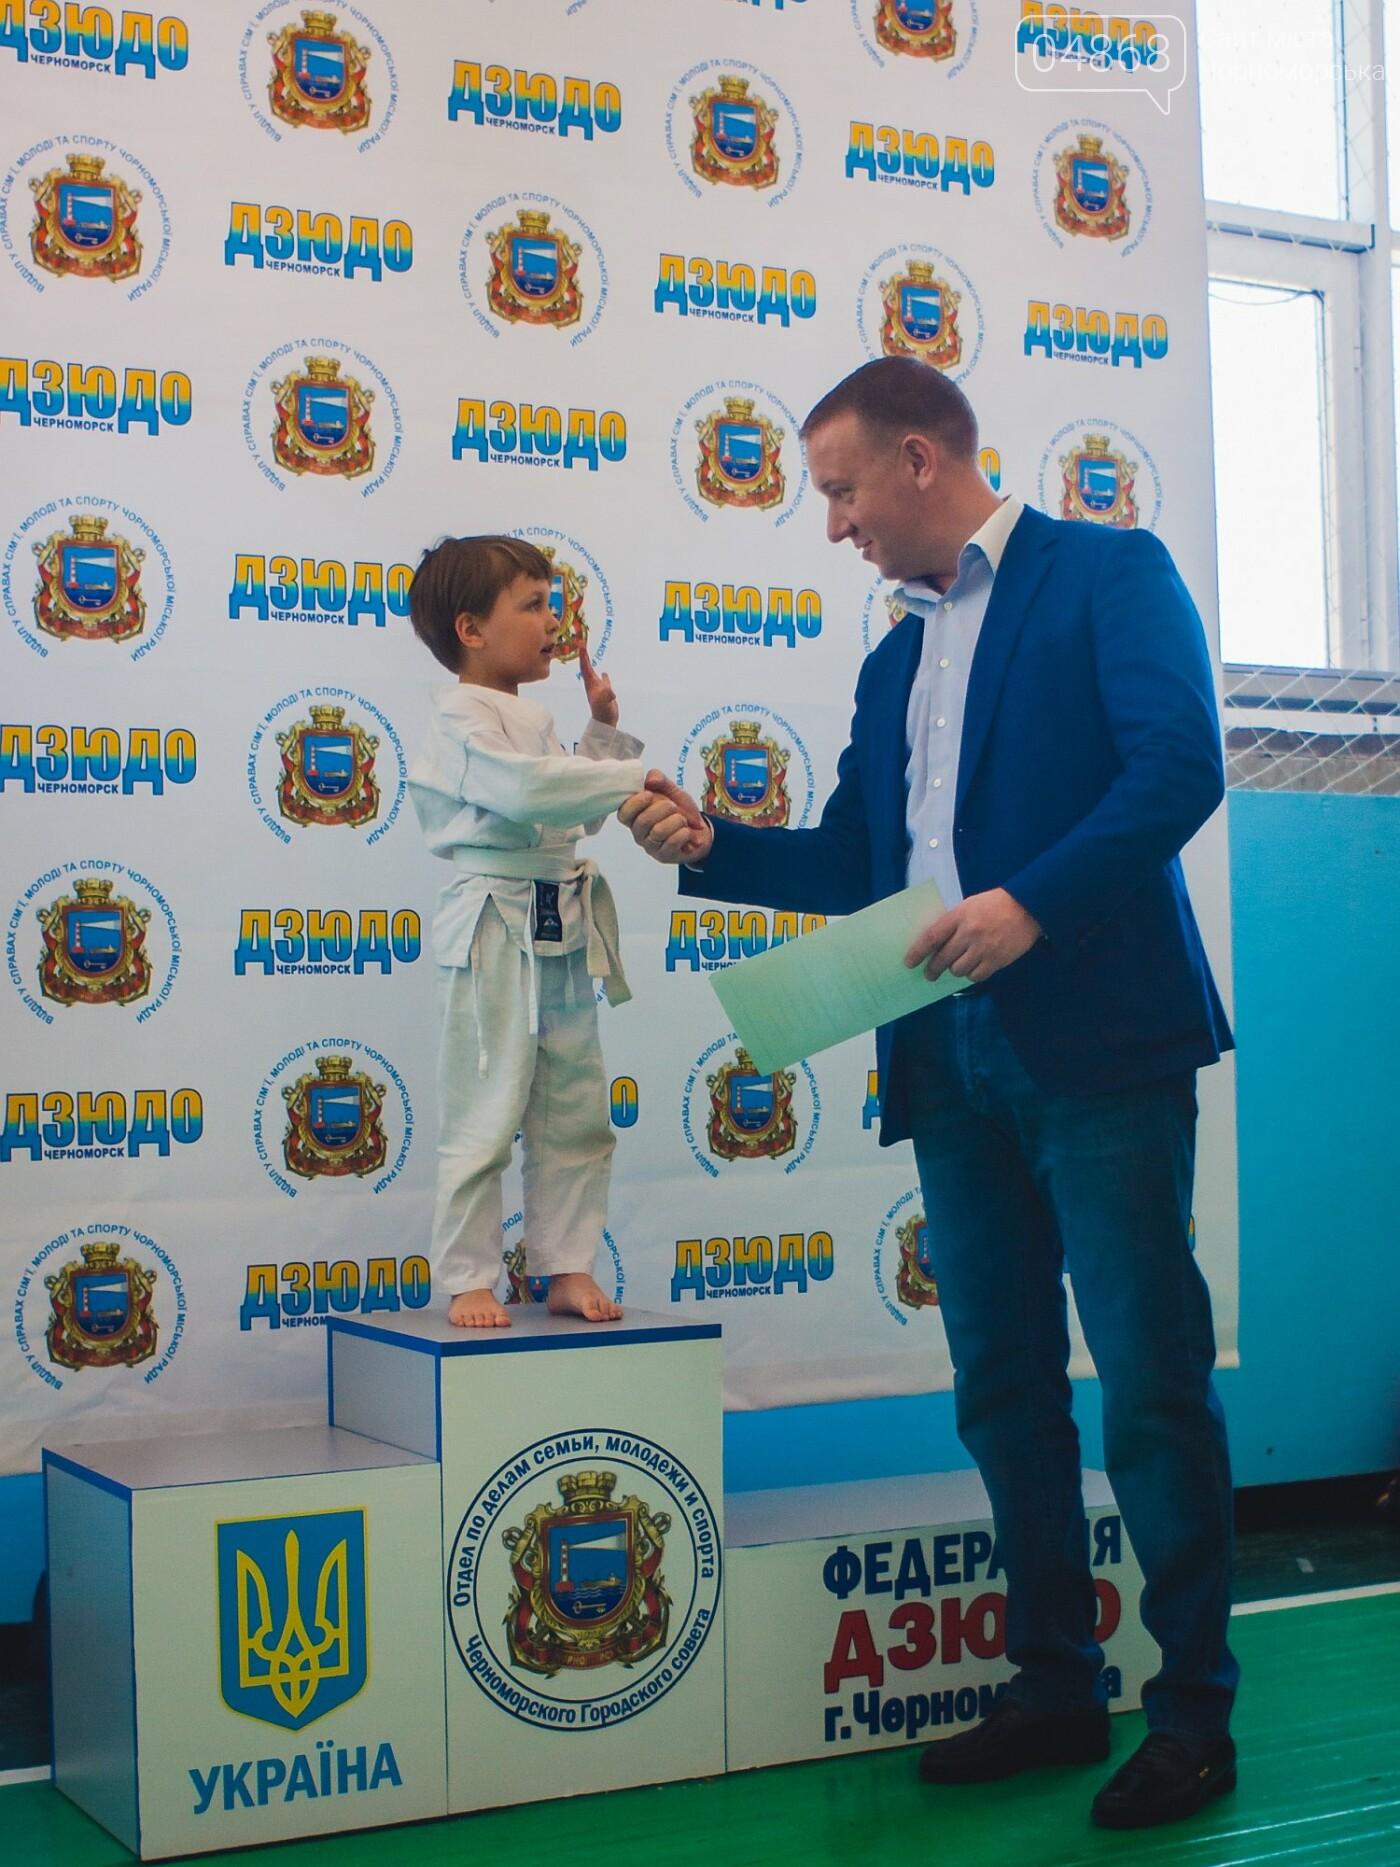 В Черноморске прошел турнир по дзюдо на Кубок мэра, фото-20